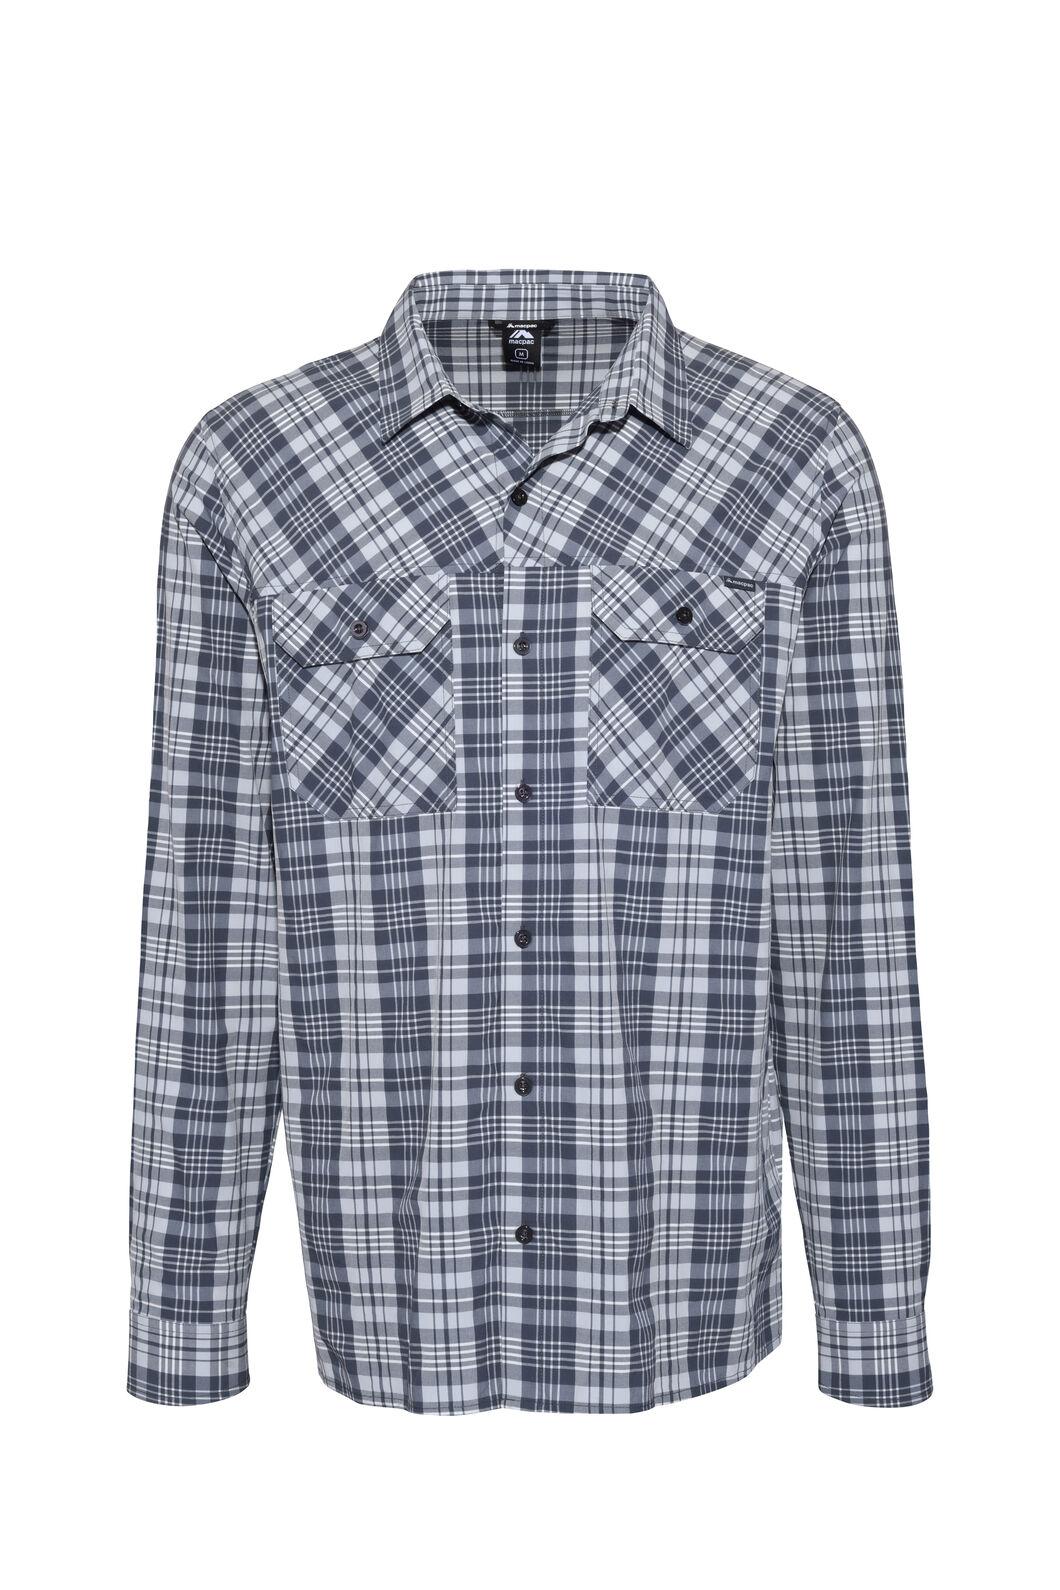 Macpac Eclipse Long Sleeve Shirt — Men's, India Ink, hi-res